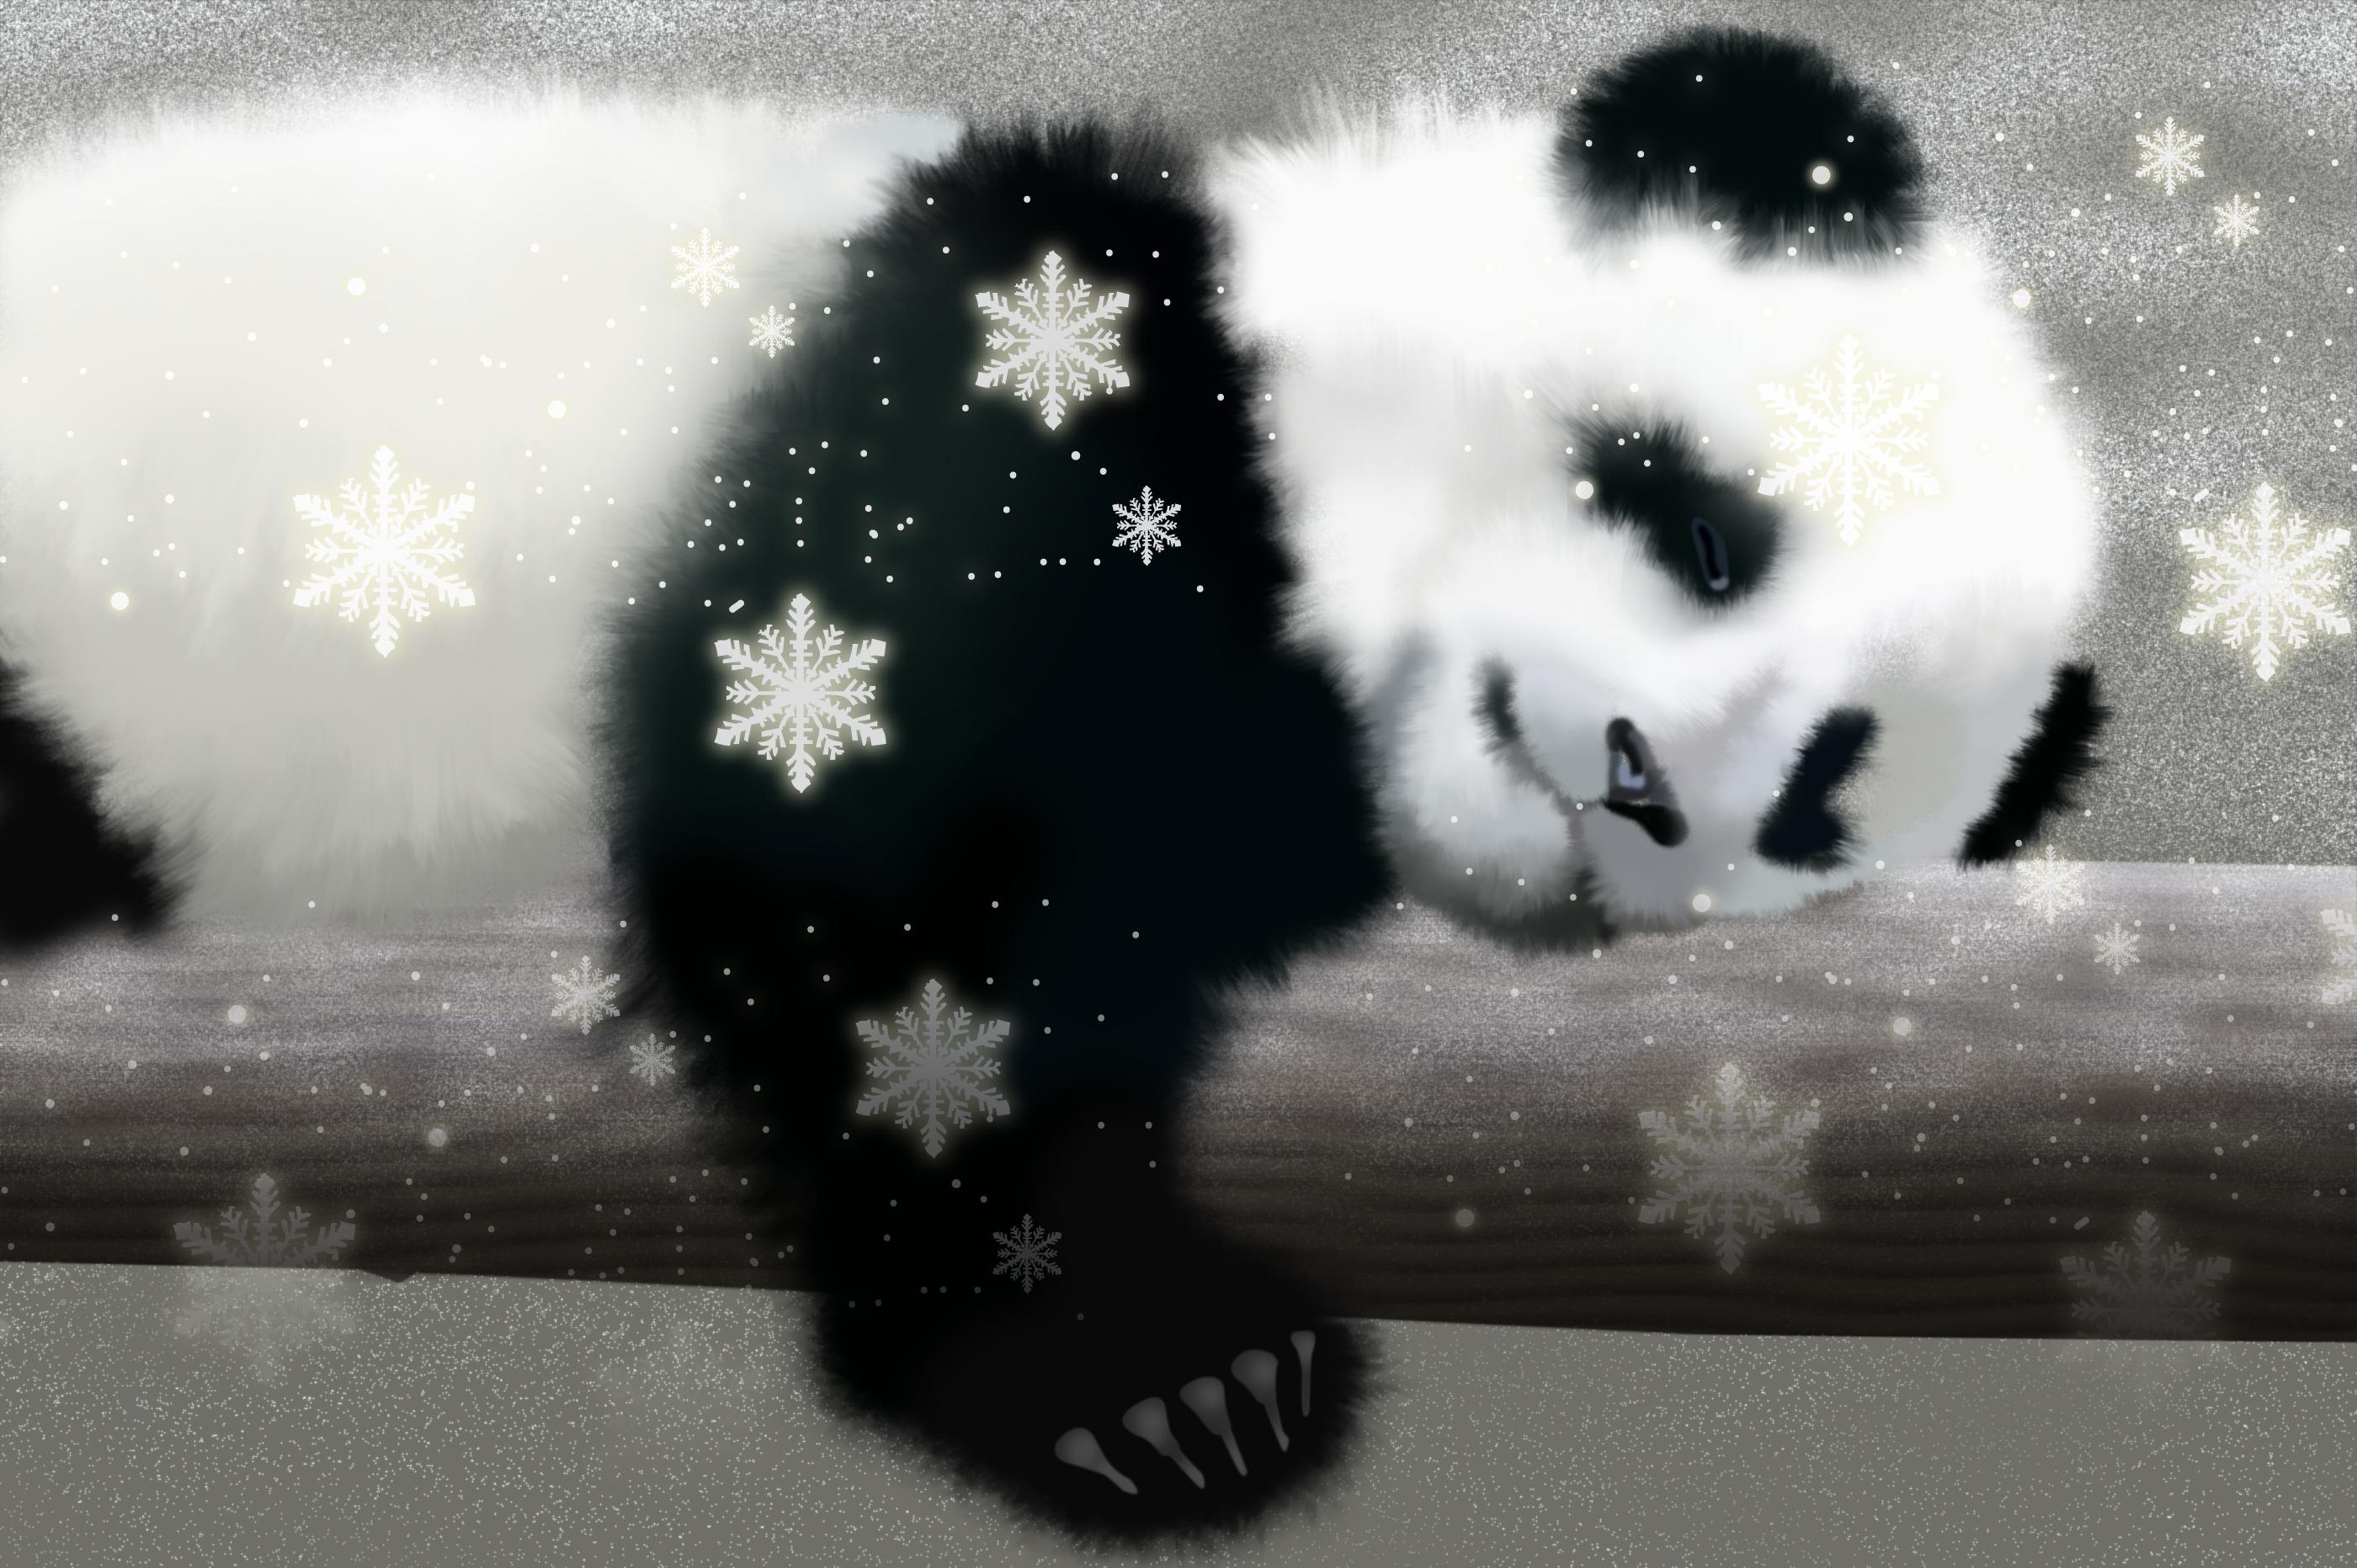 URL httpbackground picturesfeedionetcute panda wallpapers 2800x1863